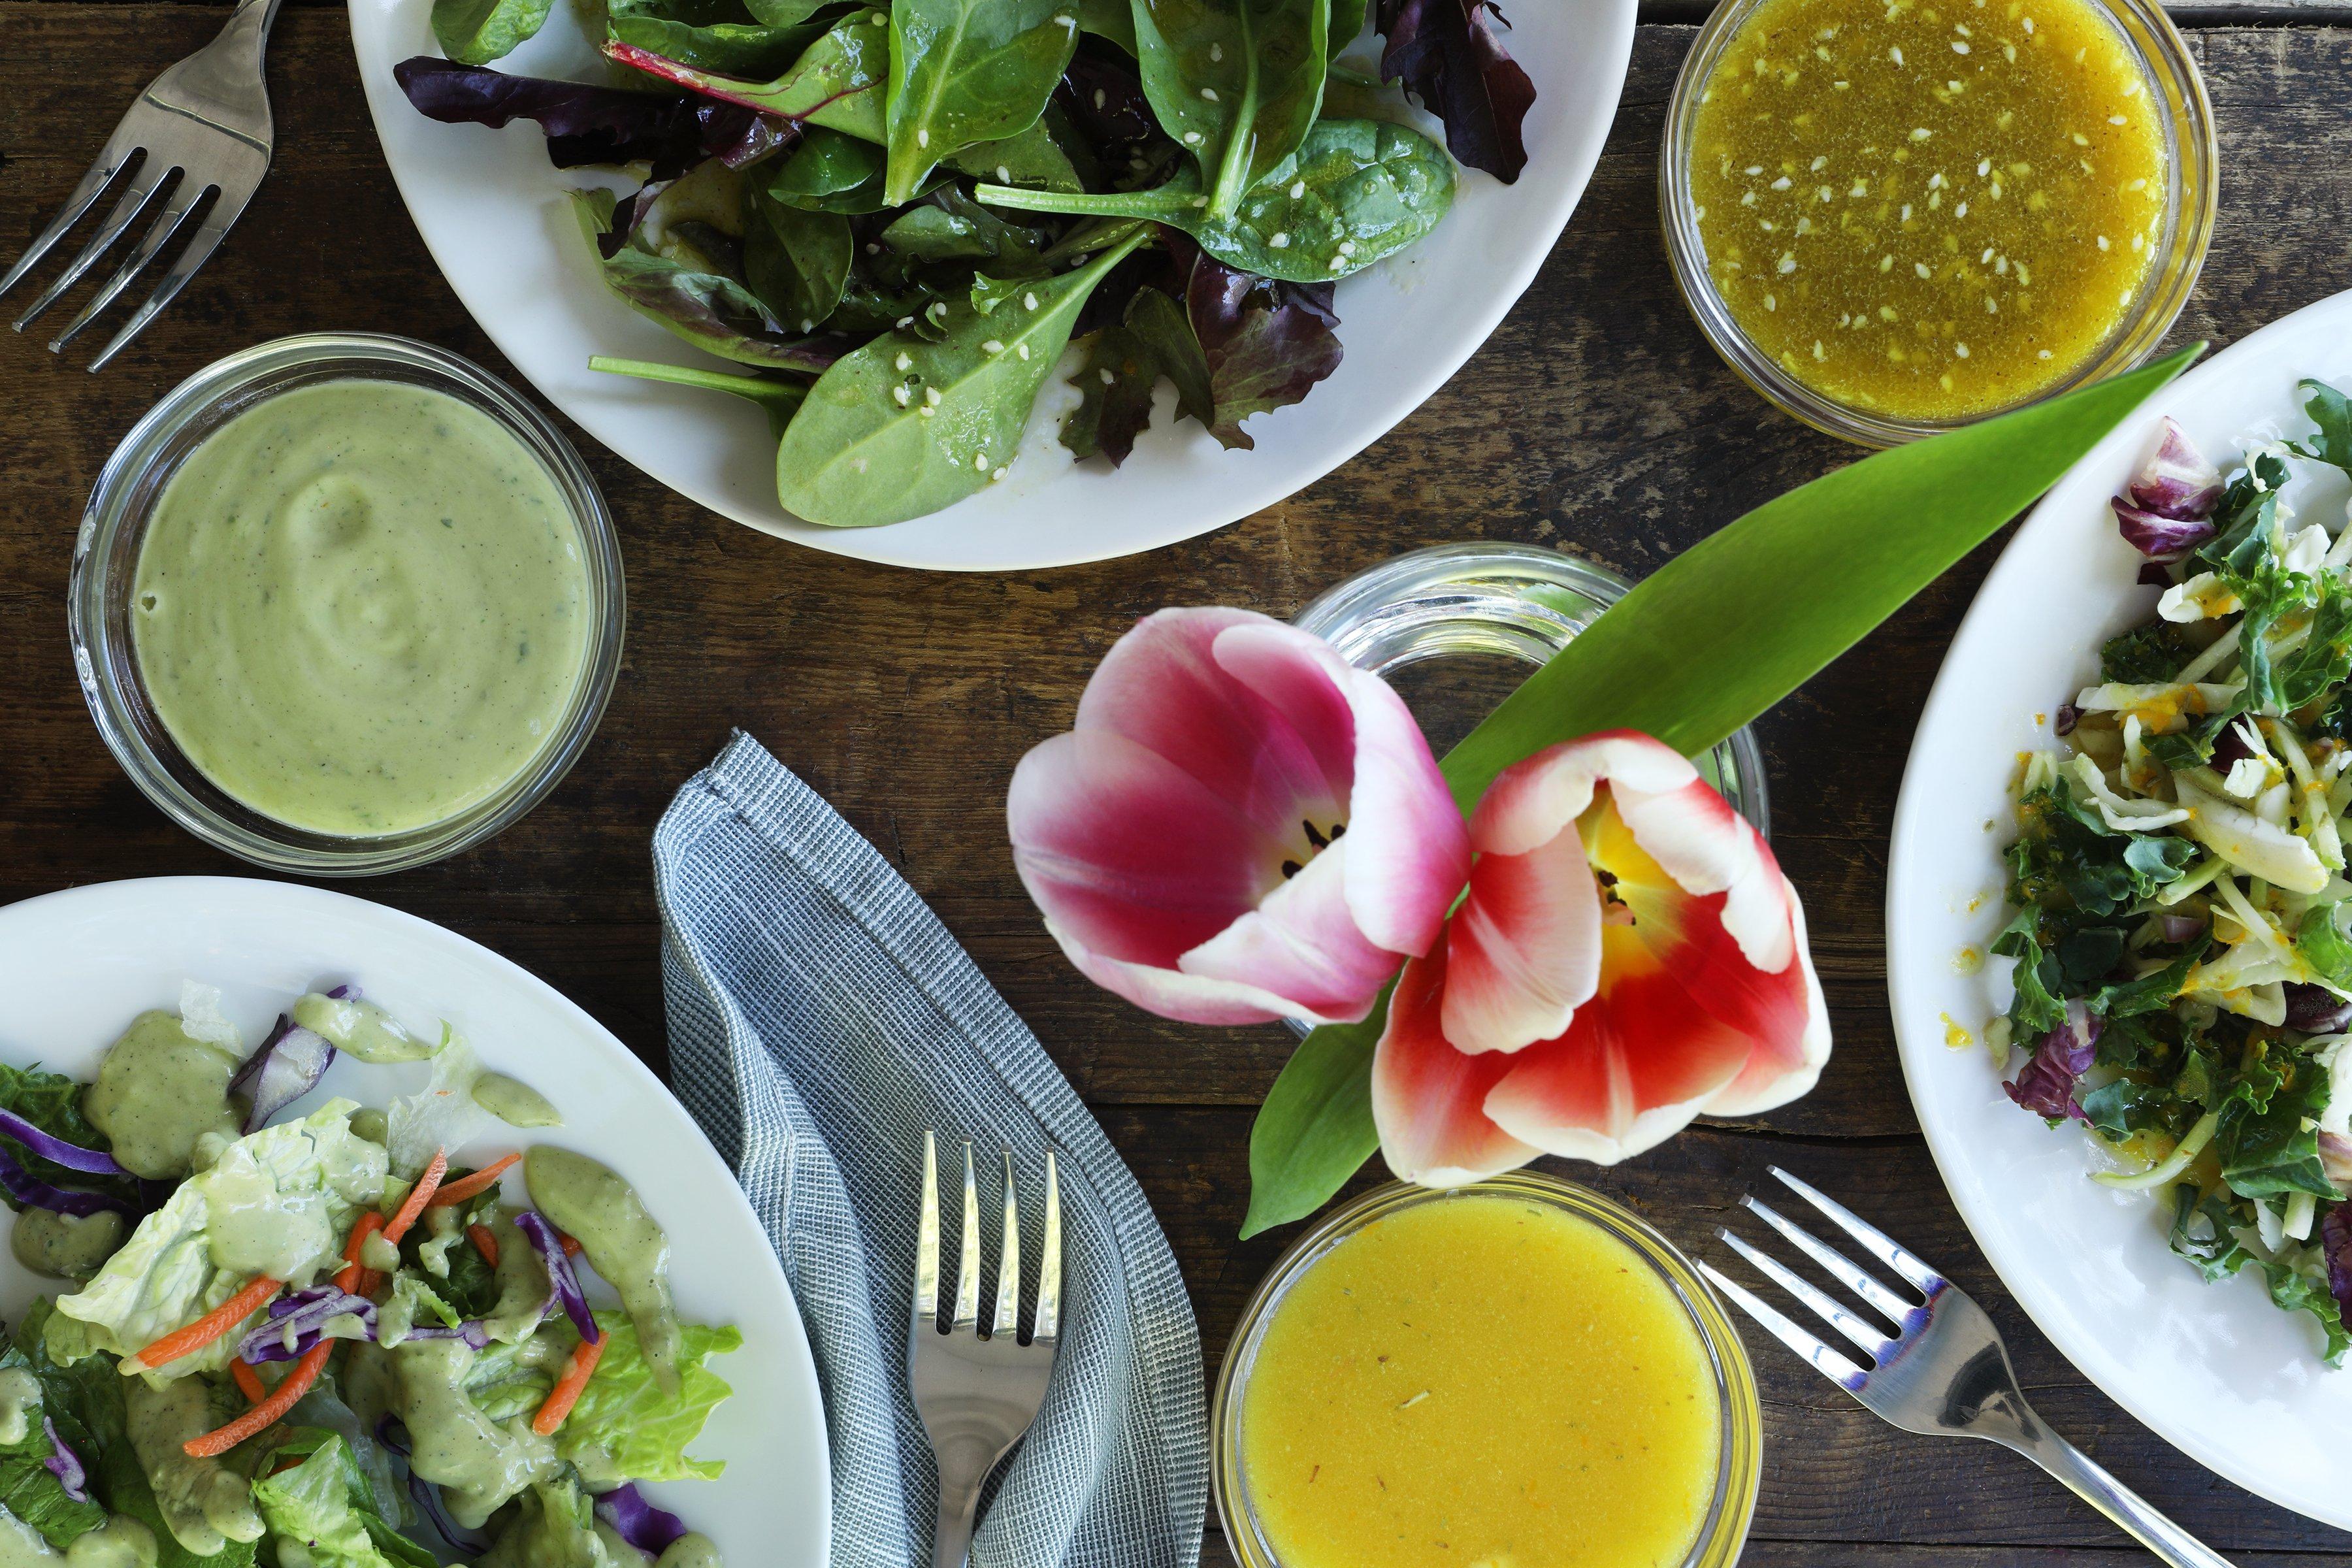 Three bowls of fresh salad greens arranged with fresh tulips and organic salad dressings.